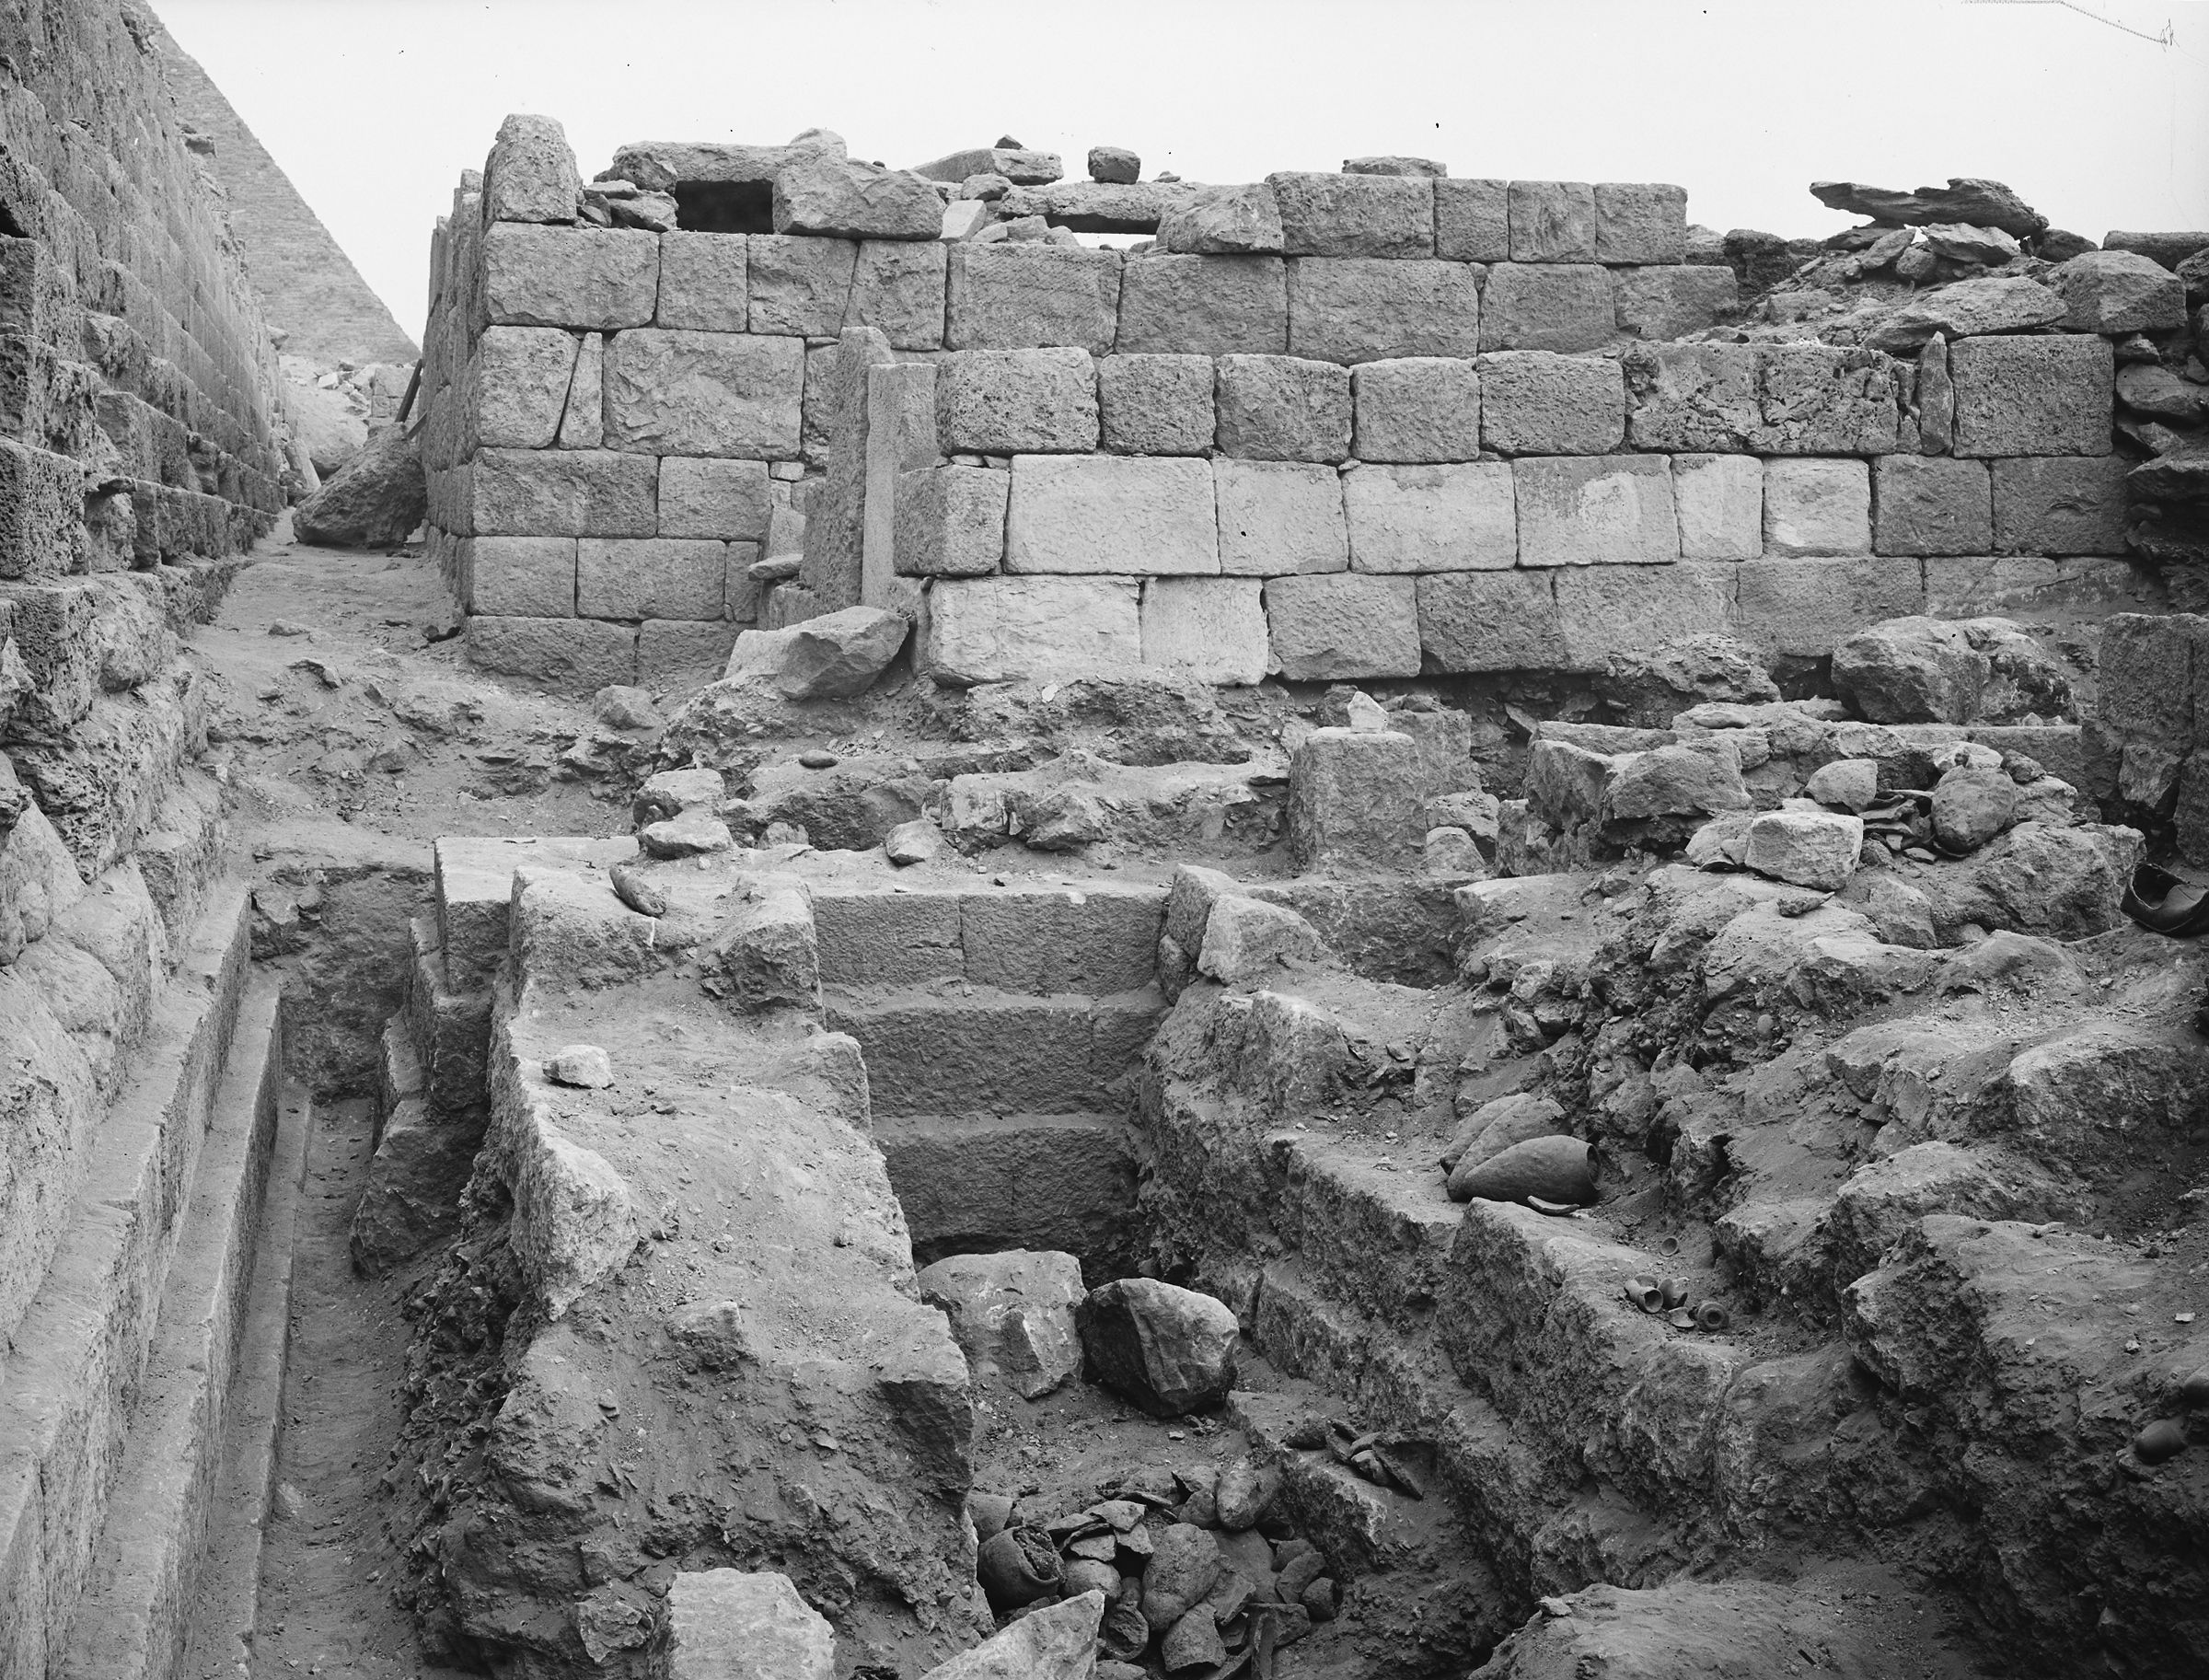 Western Cemetery: Site: Giza; View: G 1047, G 1048, G 1049, G 1050, G 1085